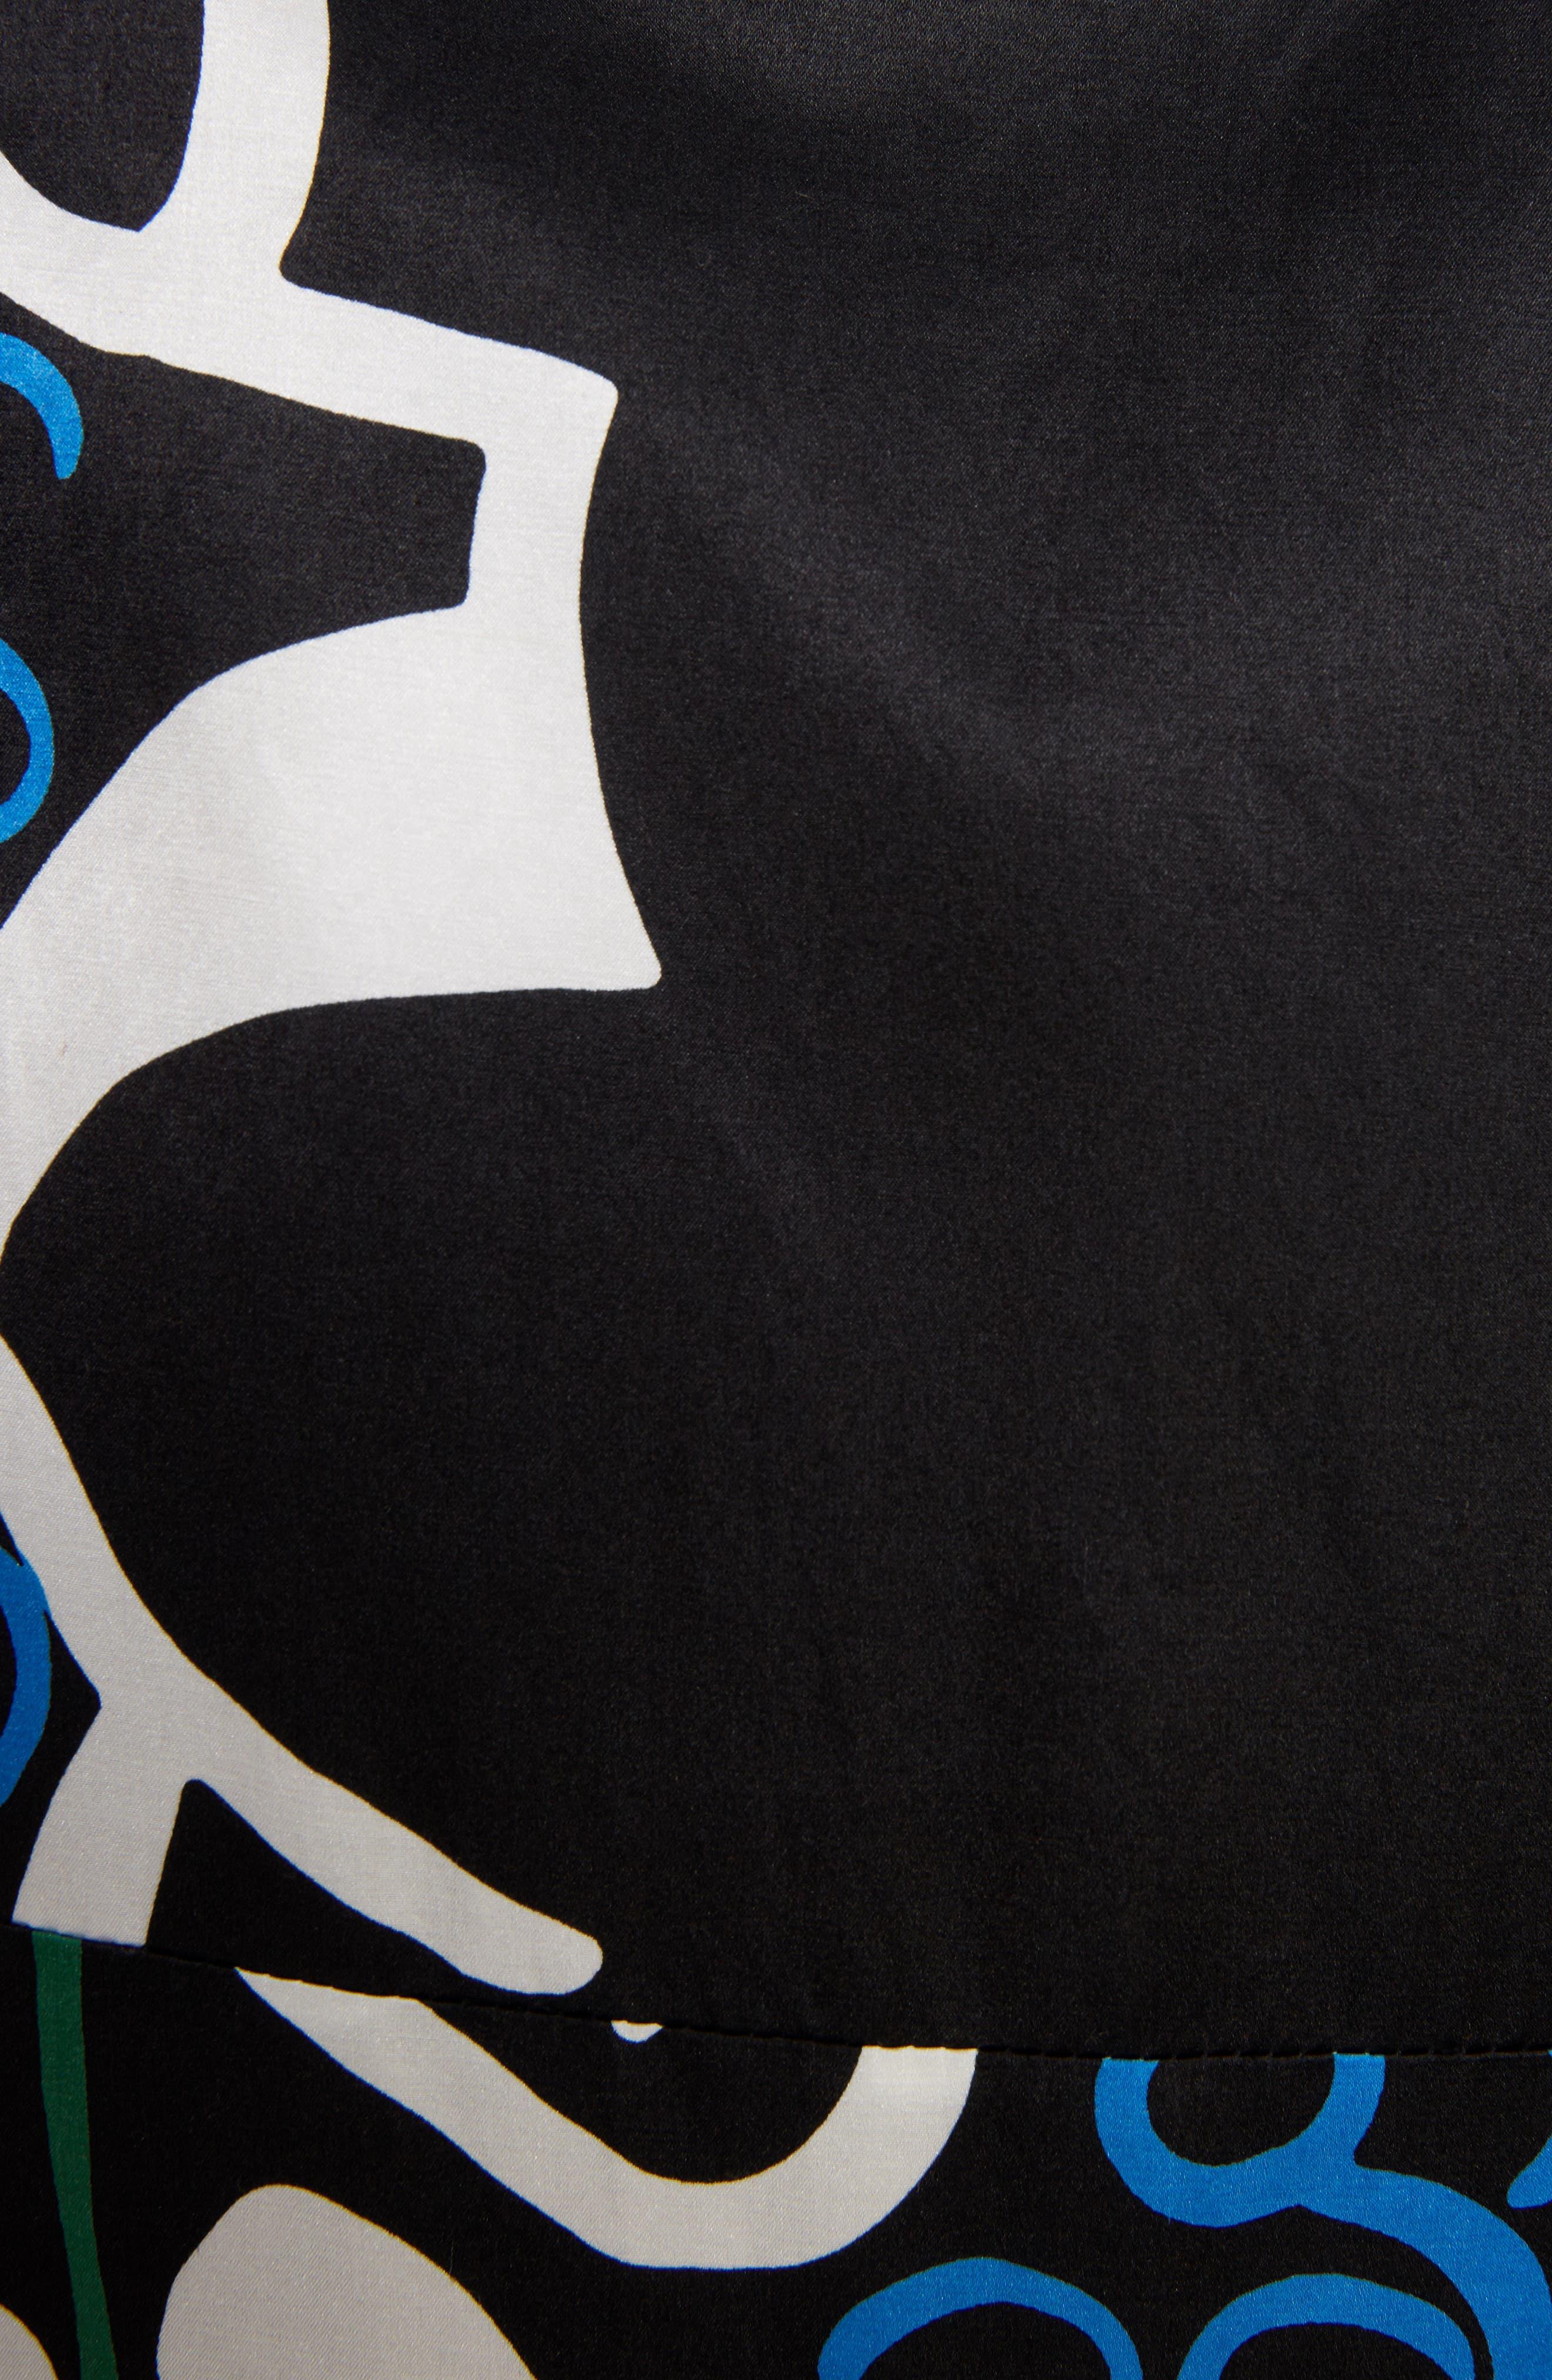 Foxglove Print Dress with Ribbon Detail,                             Alternate thumbnail 5, color,                             Black Foxglove Print